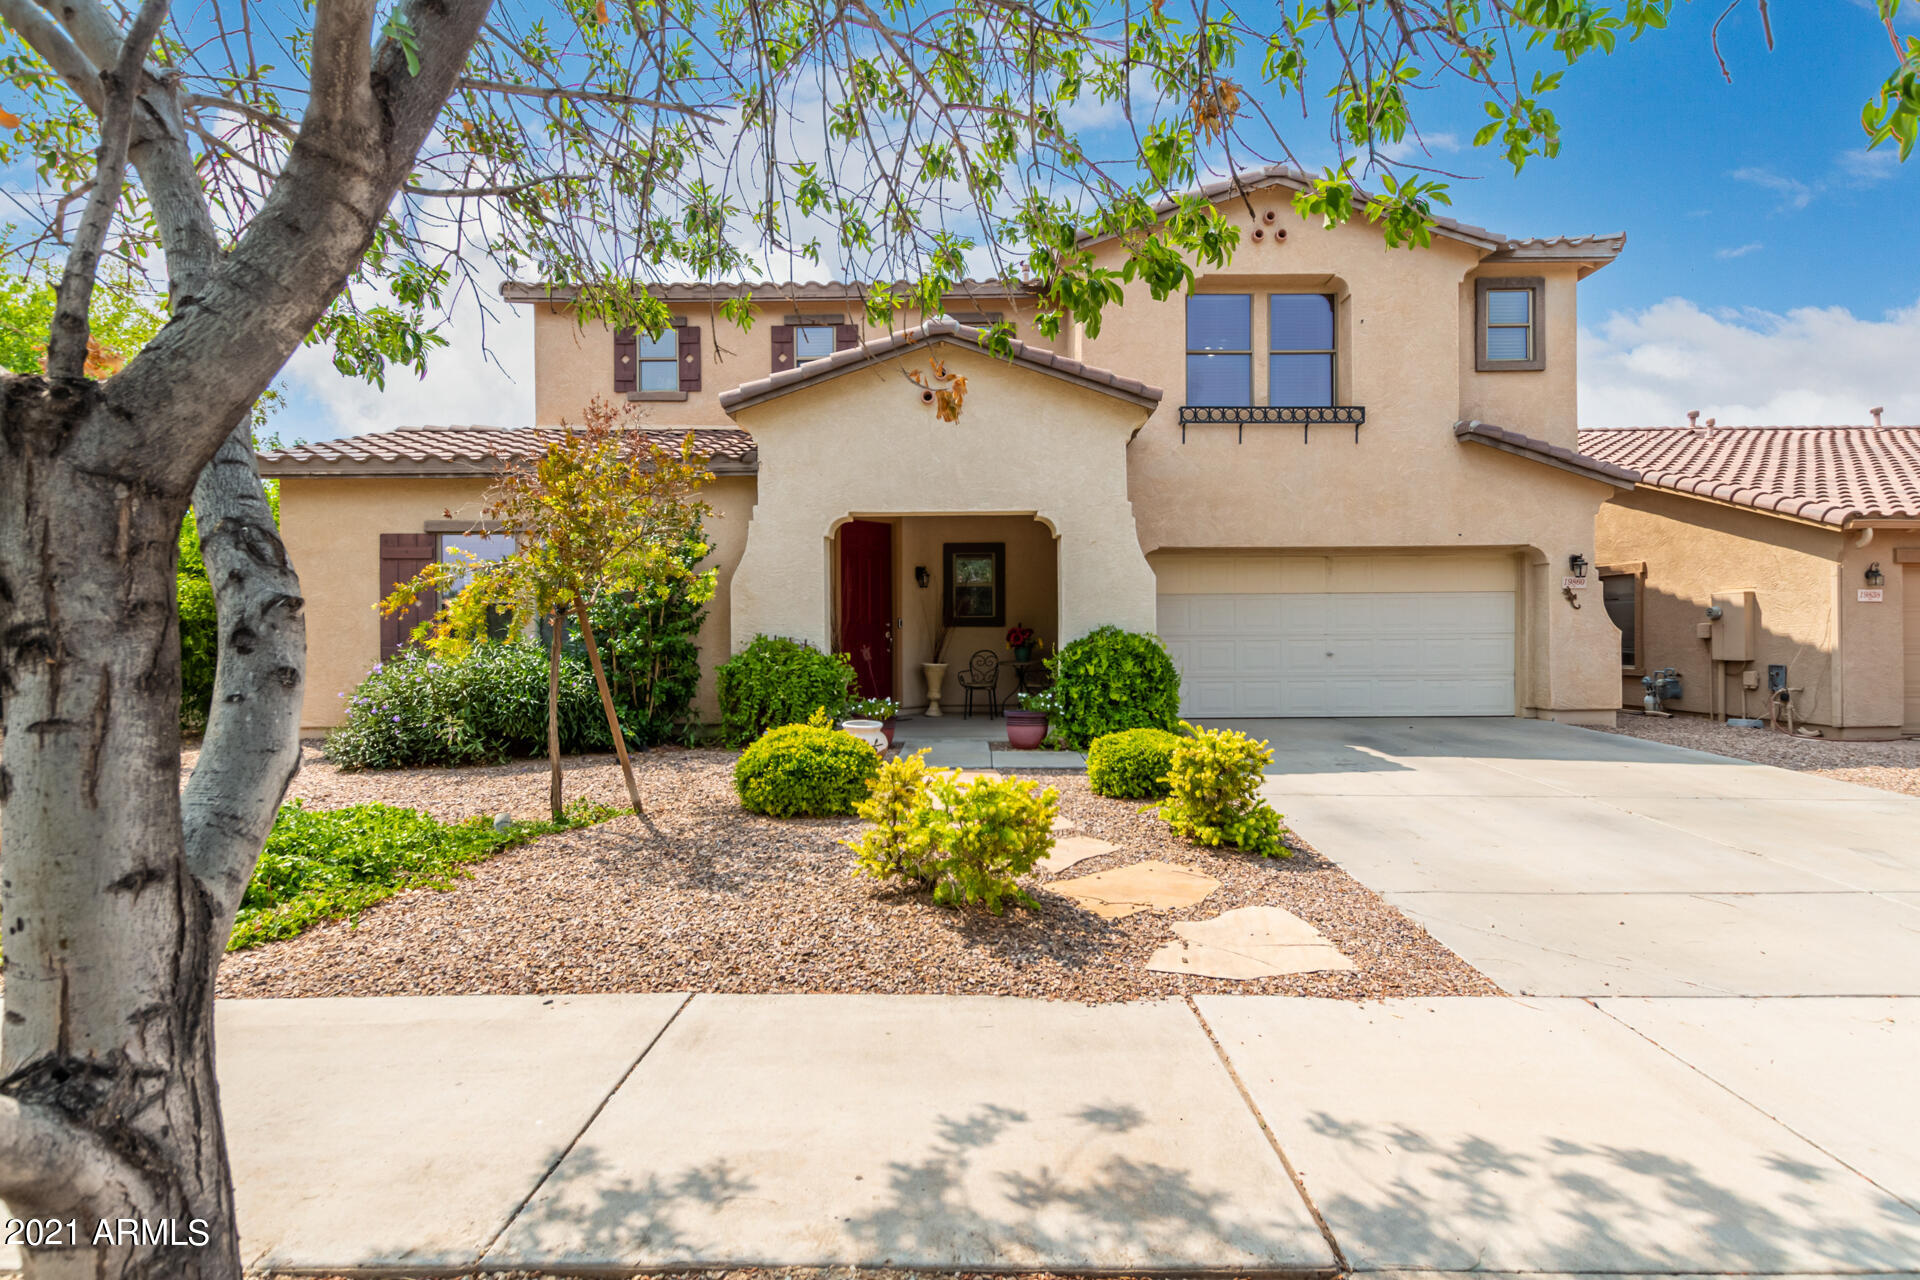 19860 S 198th Street, Queen Creek, AZ 85142, 4 Bedrooms Bedrooms, ,Residential,For Sale,19860 S 198th Street,6268883